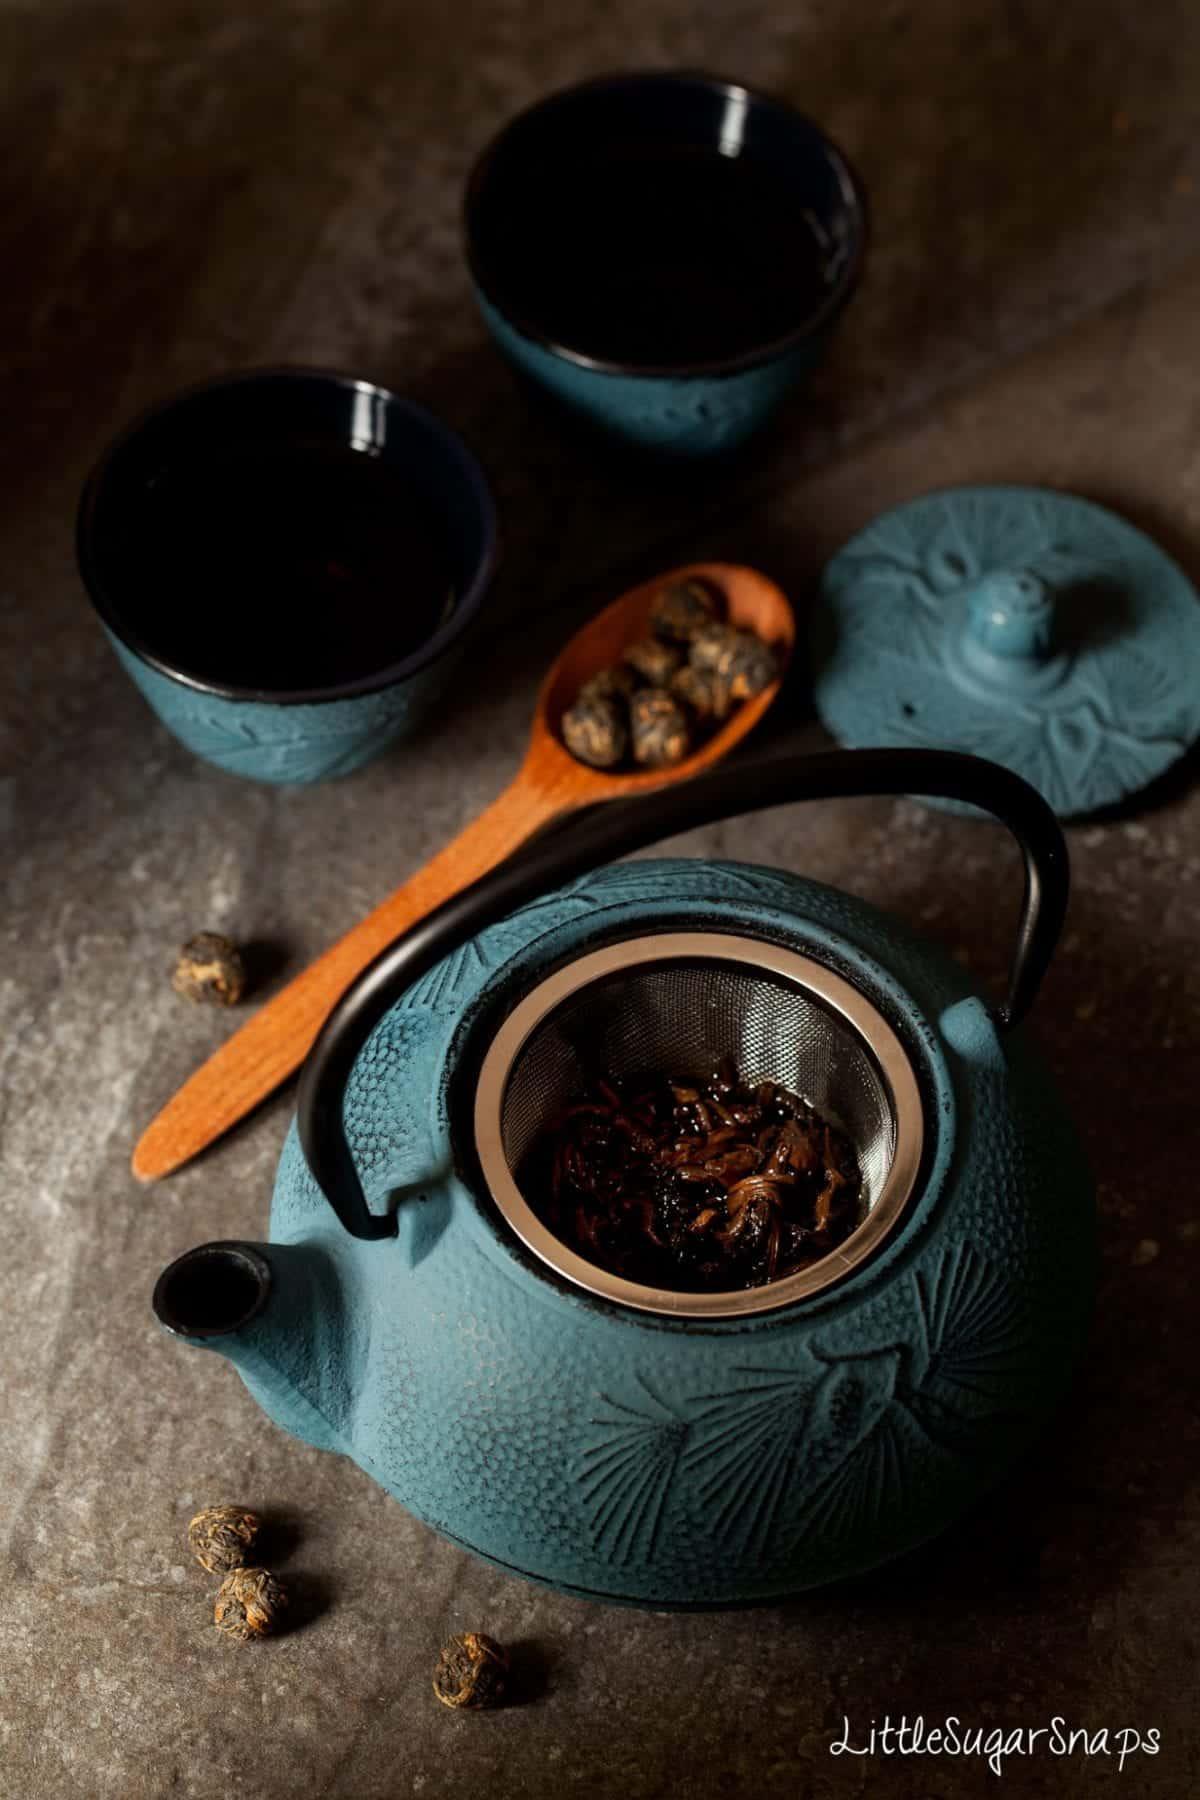 Tea brewing in a blue cast iron teapot.